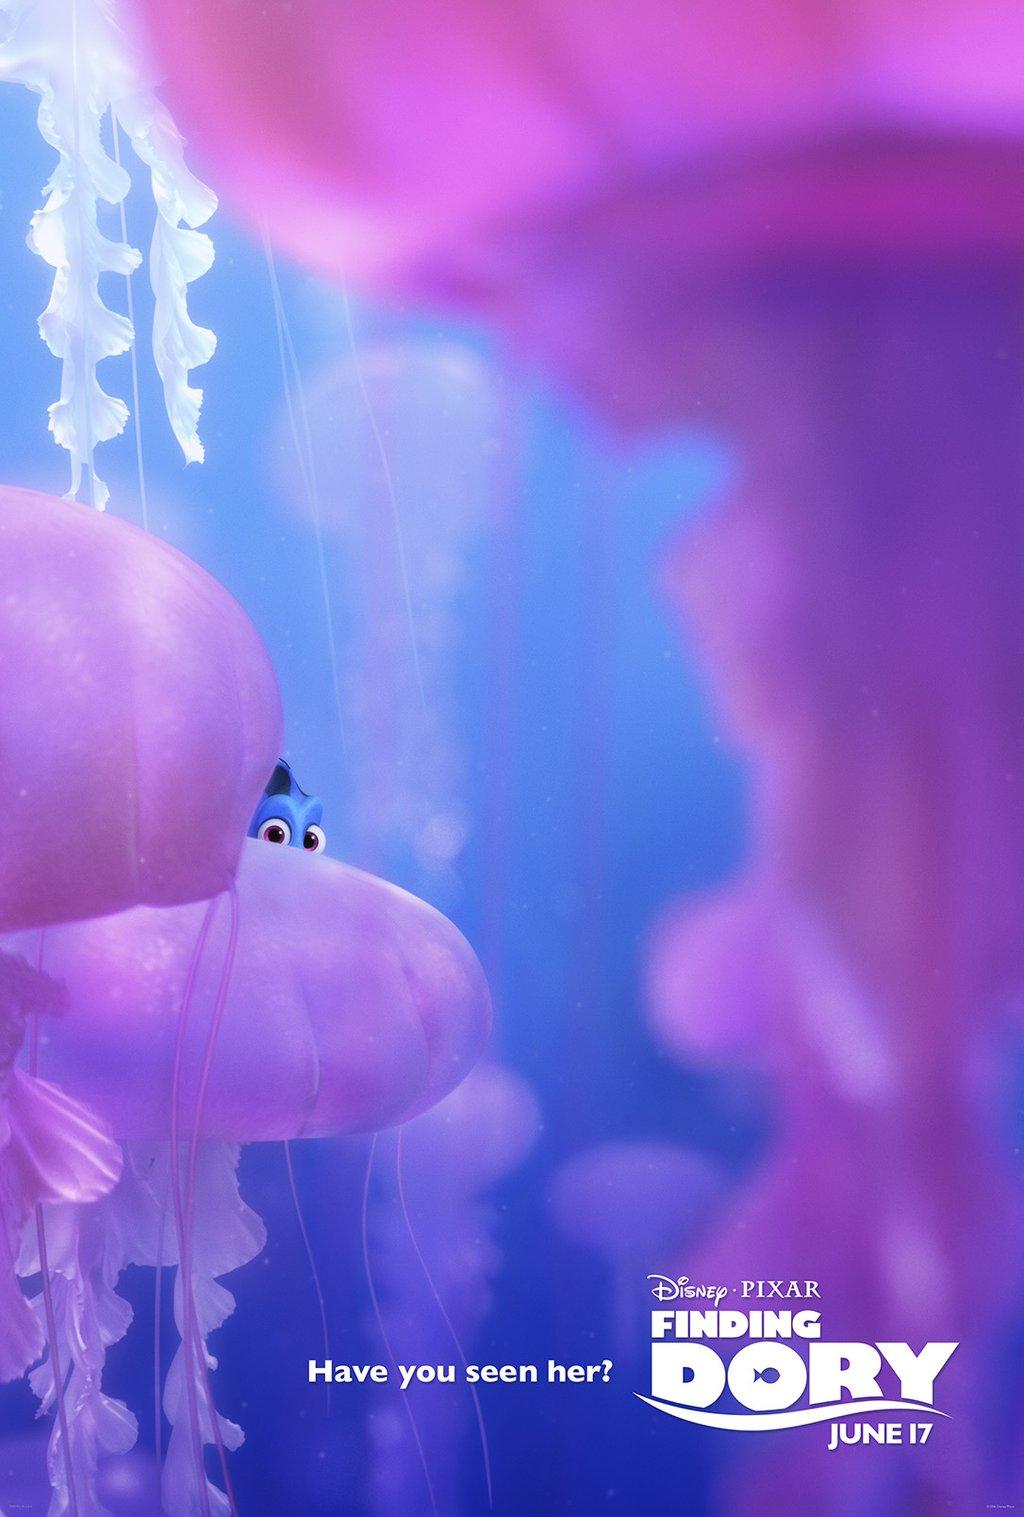 Finding-Dory-Regal-Cinemas-Pixar-Post.jpg